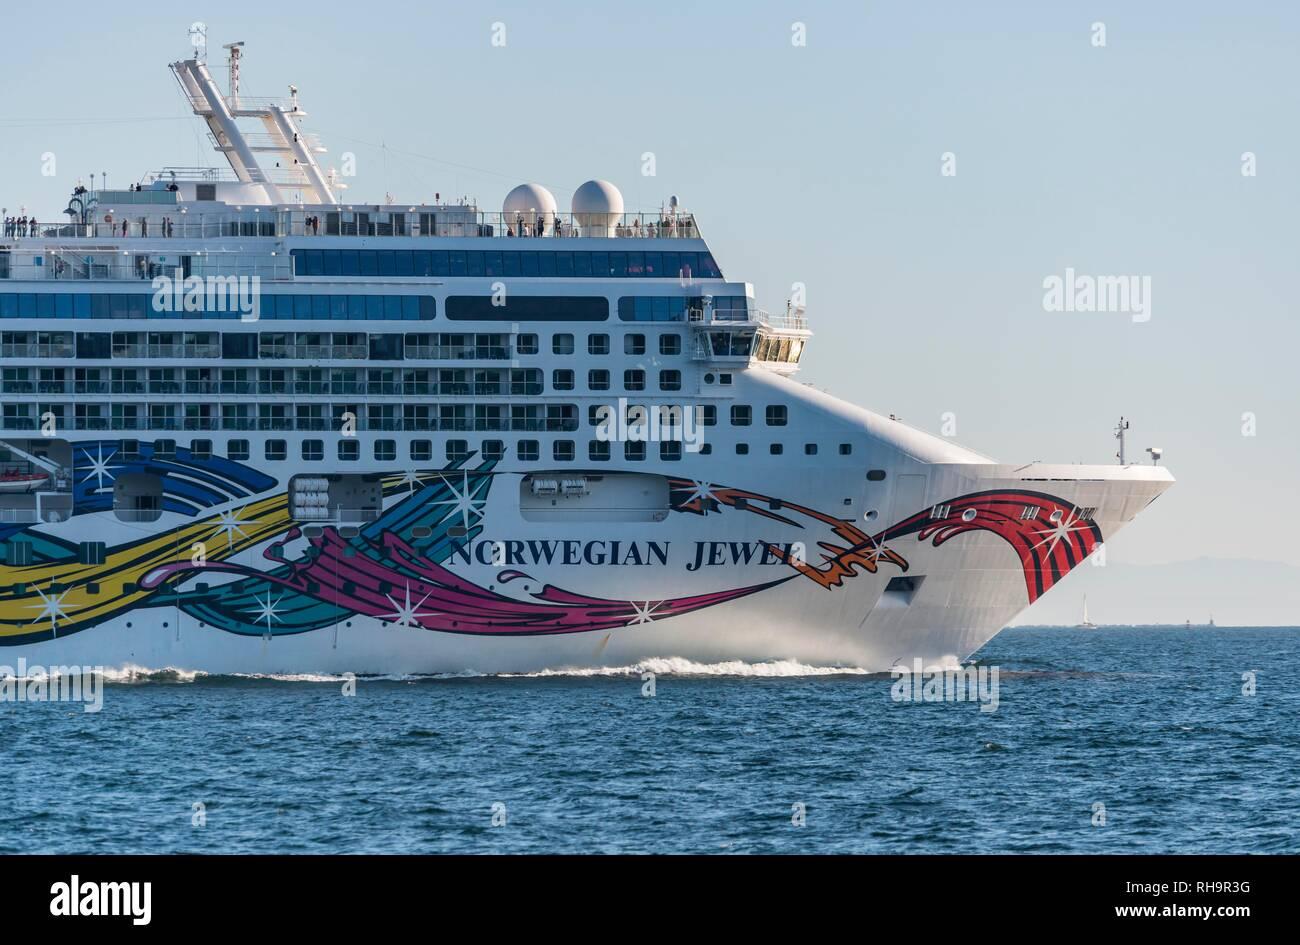 Cruise ship, Norwegian Jewel on the sea, near Vancouver, British Columbia, Canada - Stock Image